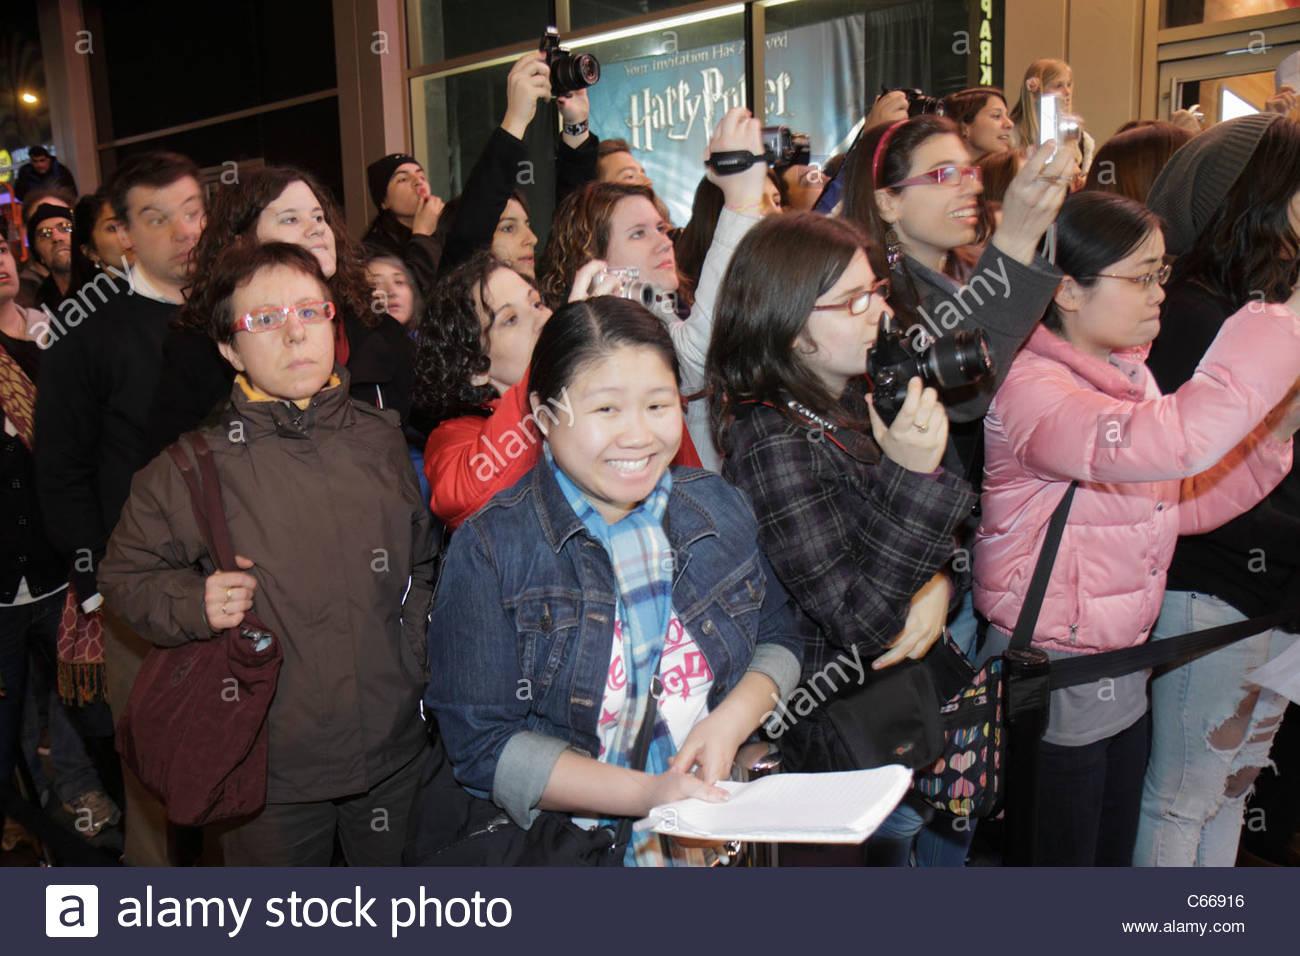 New York New York City NYC Midtown Manhattan 44th Street Harry Potter Ausstellung Red Carpet Event Eröffnung fans Stockfoto